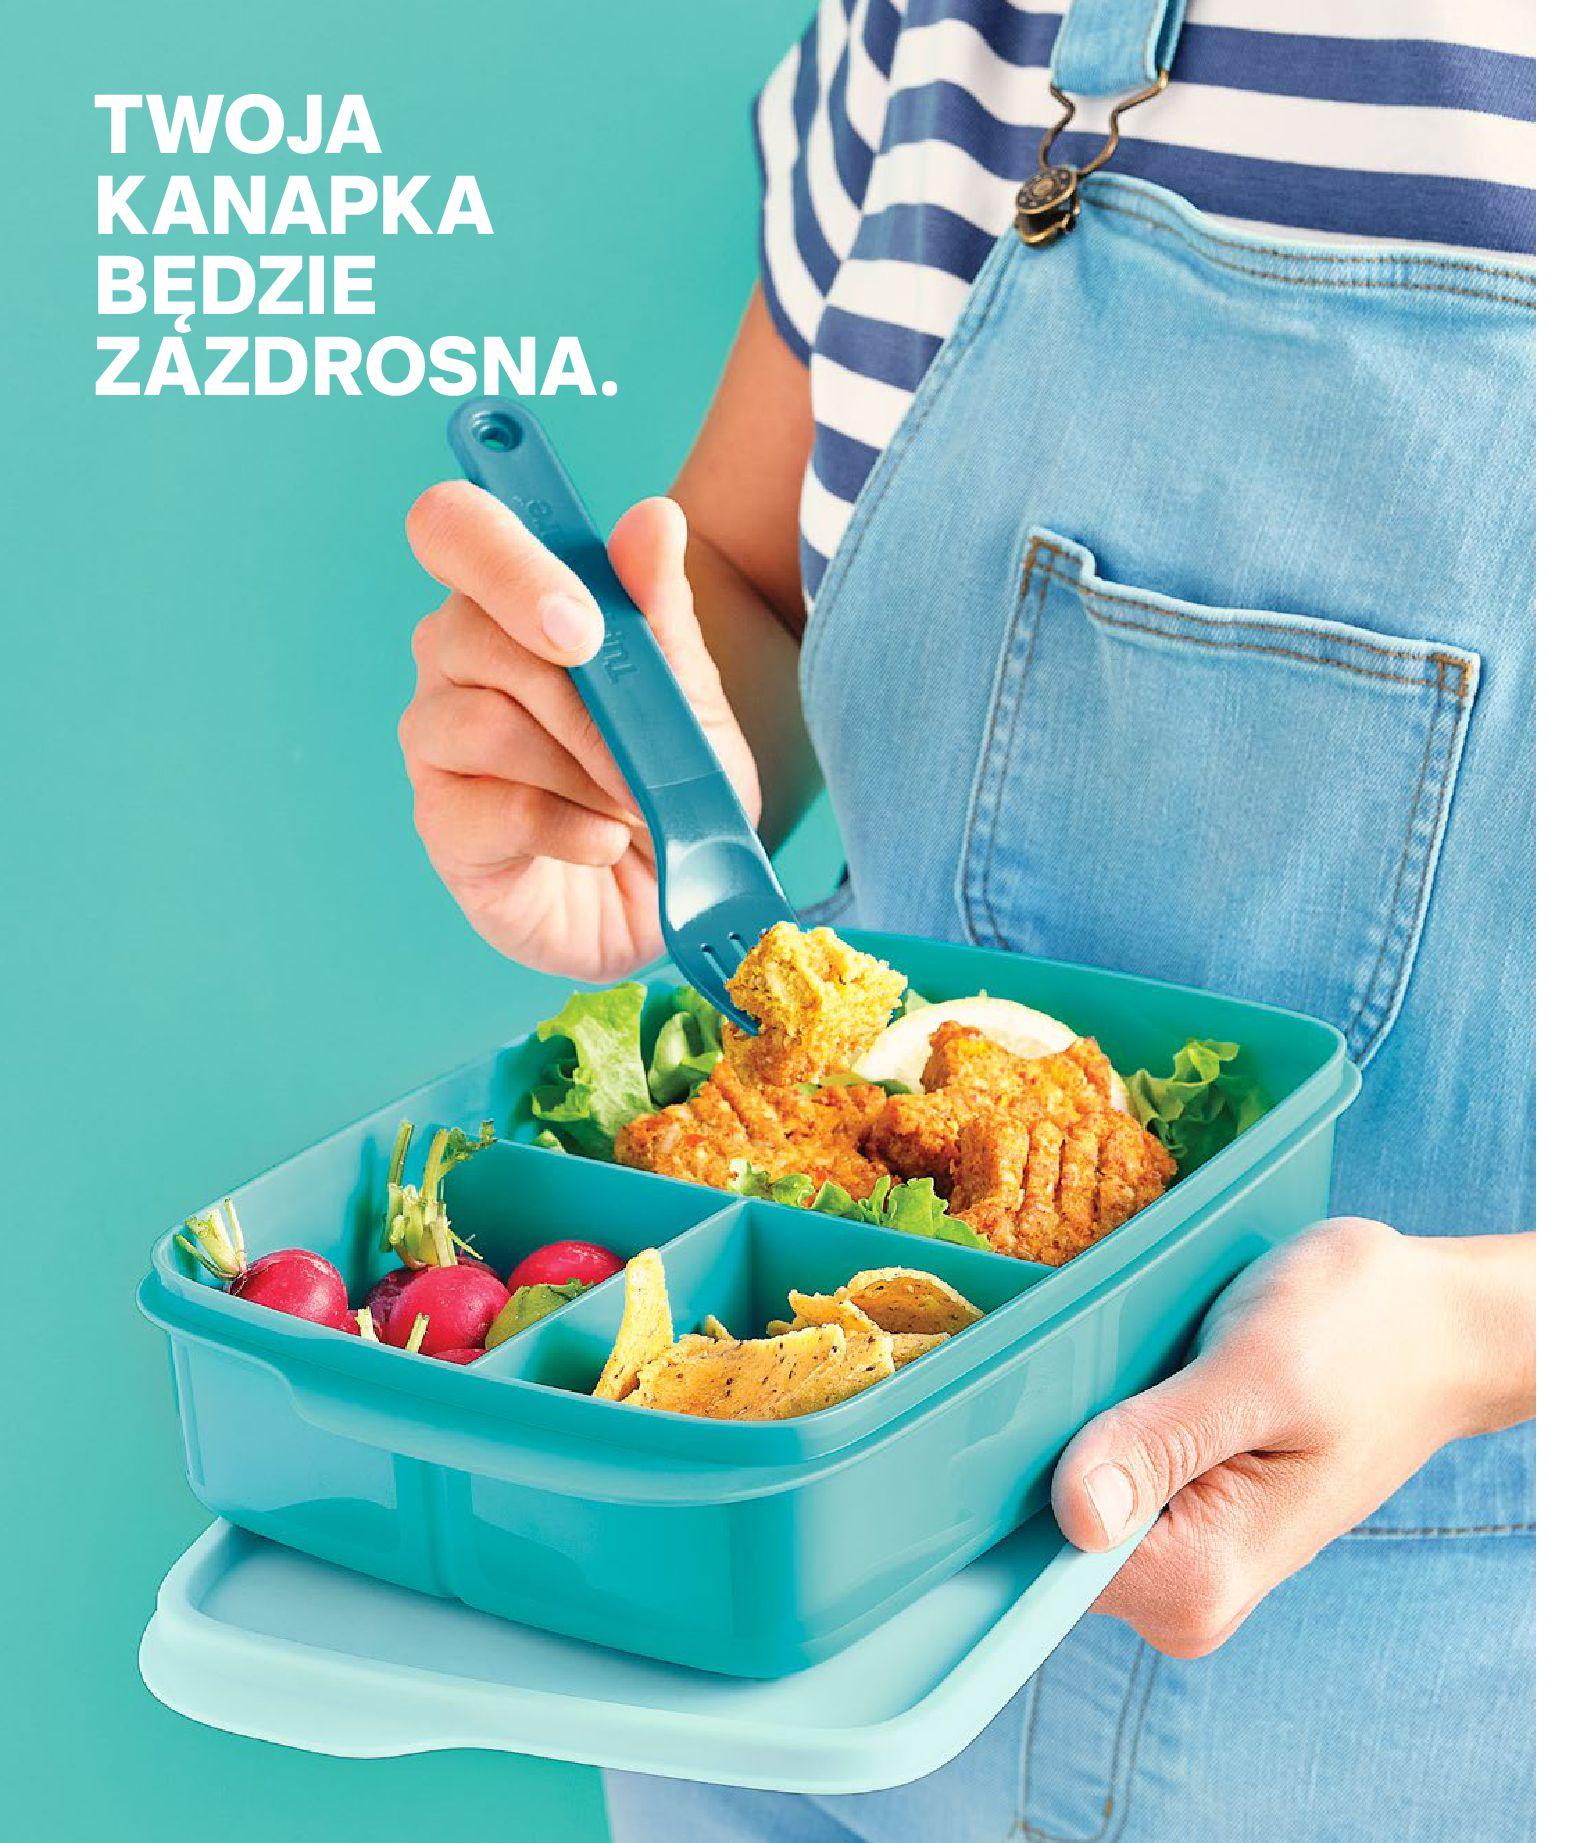 Gazetka Tupperware: Gazetka Tupperware - Katalog wiosna/ lato 2021-05-10 page-10